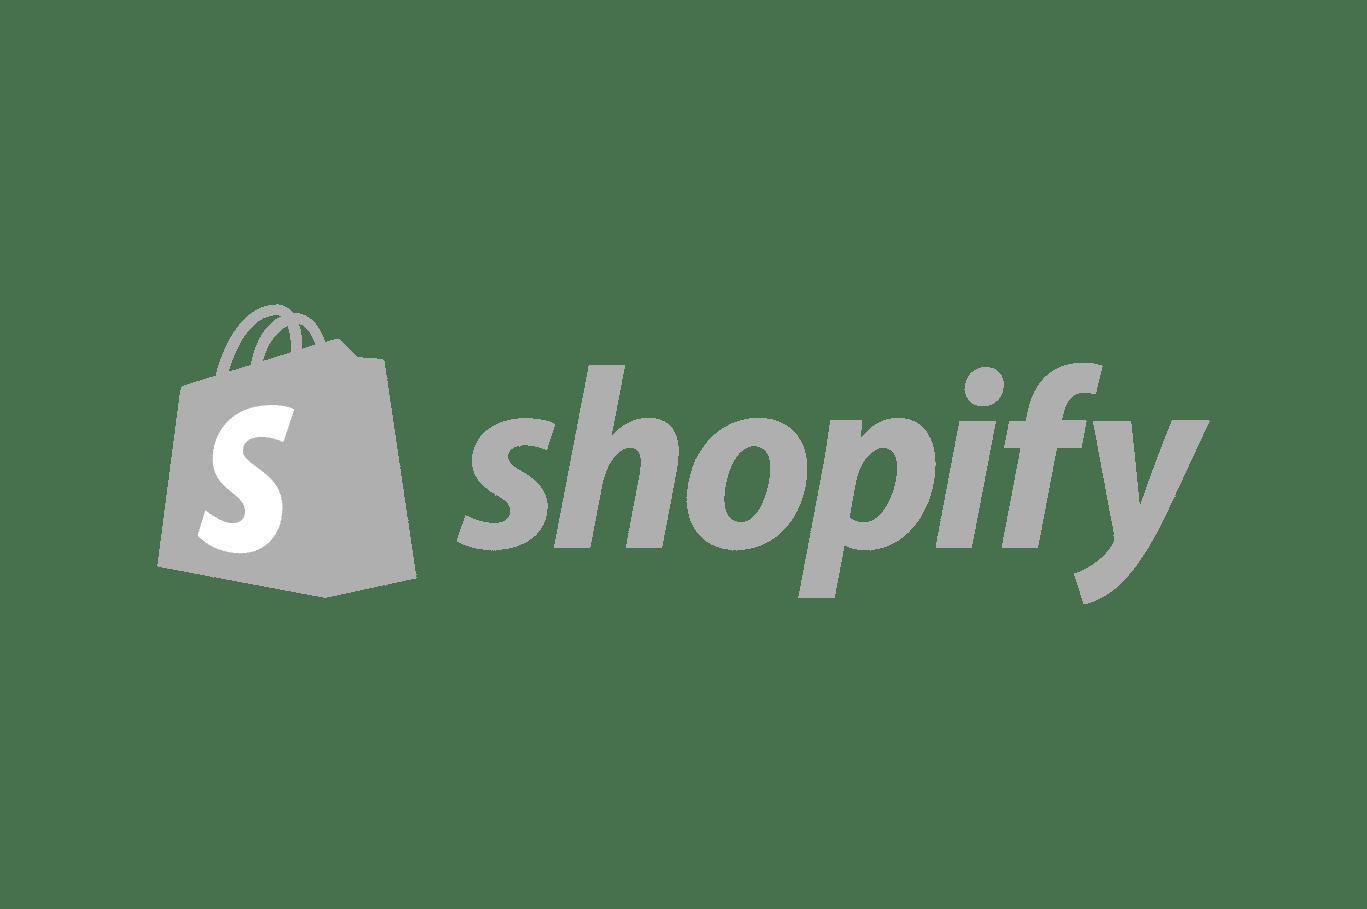 shopify logo grey scale